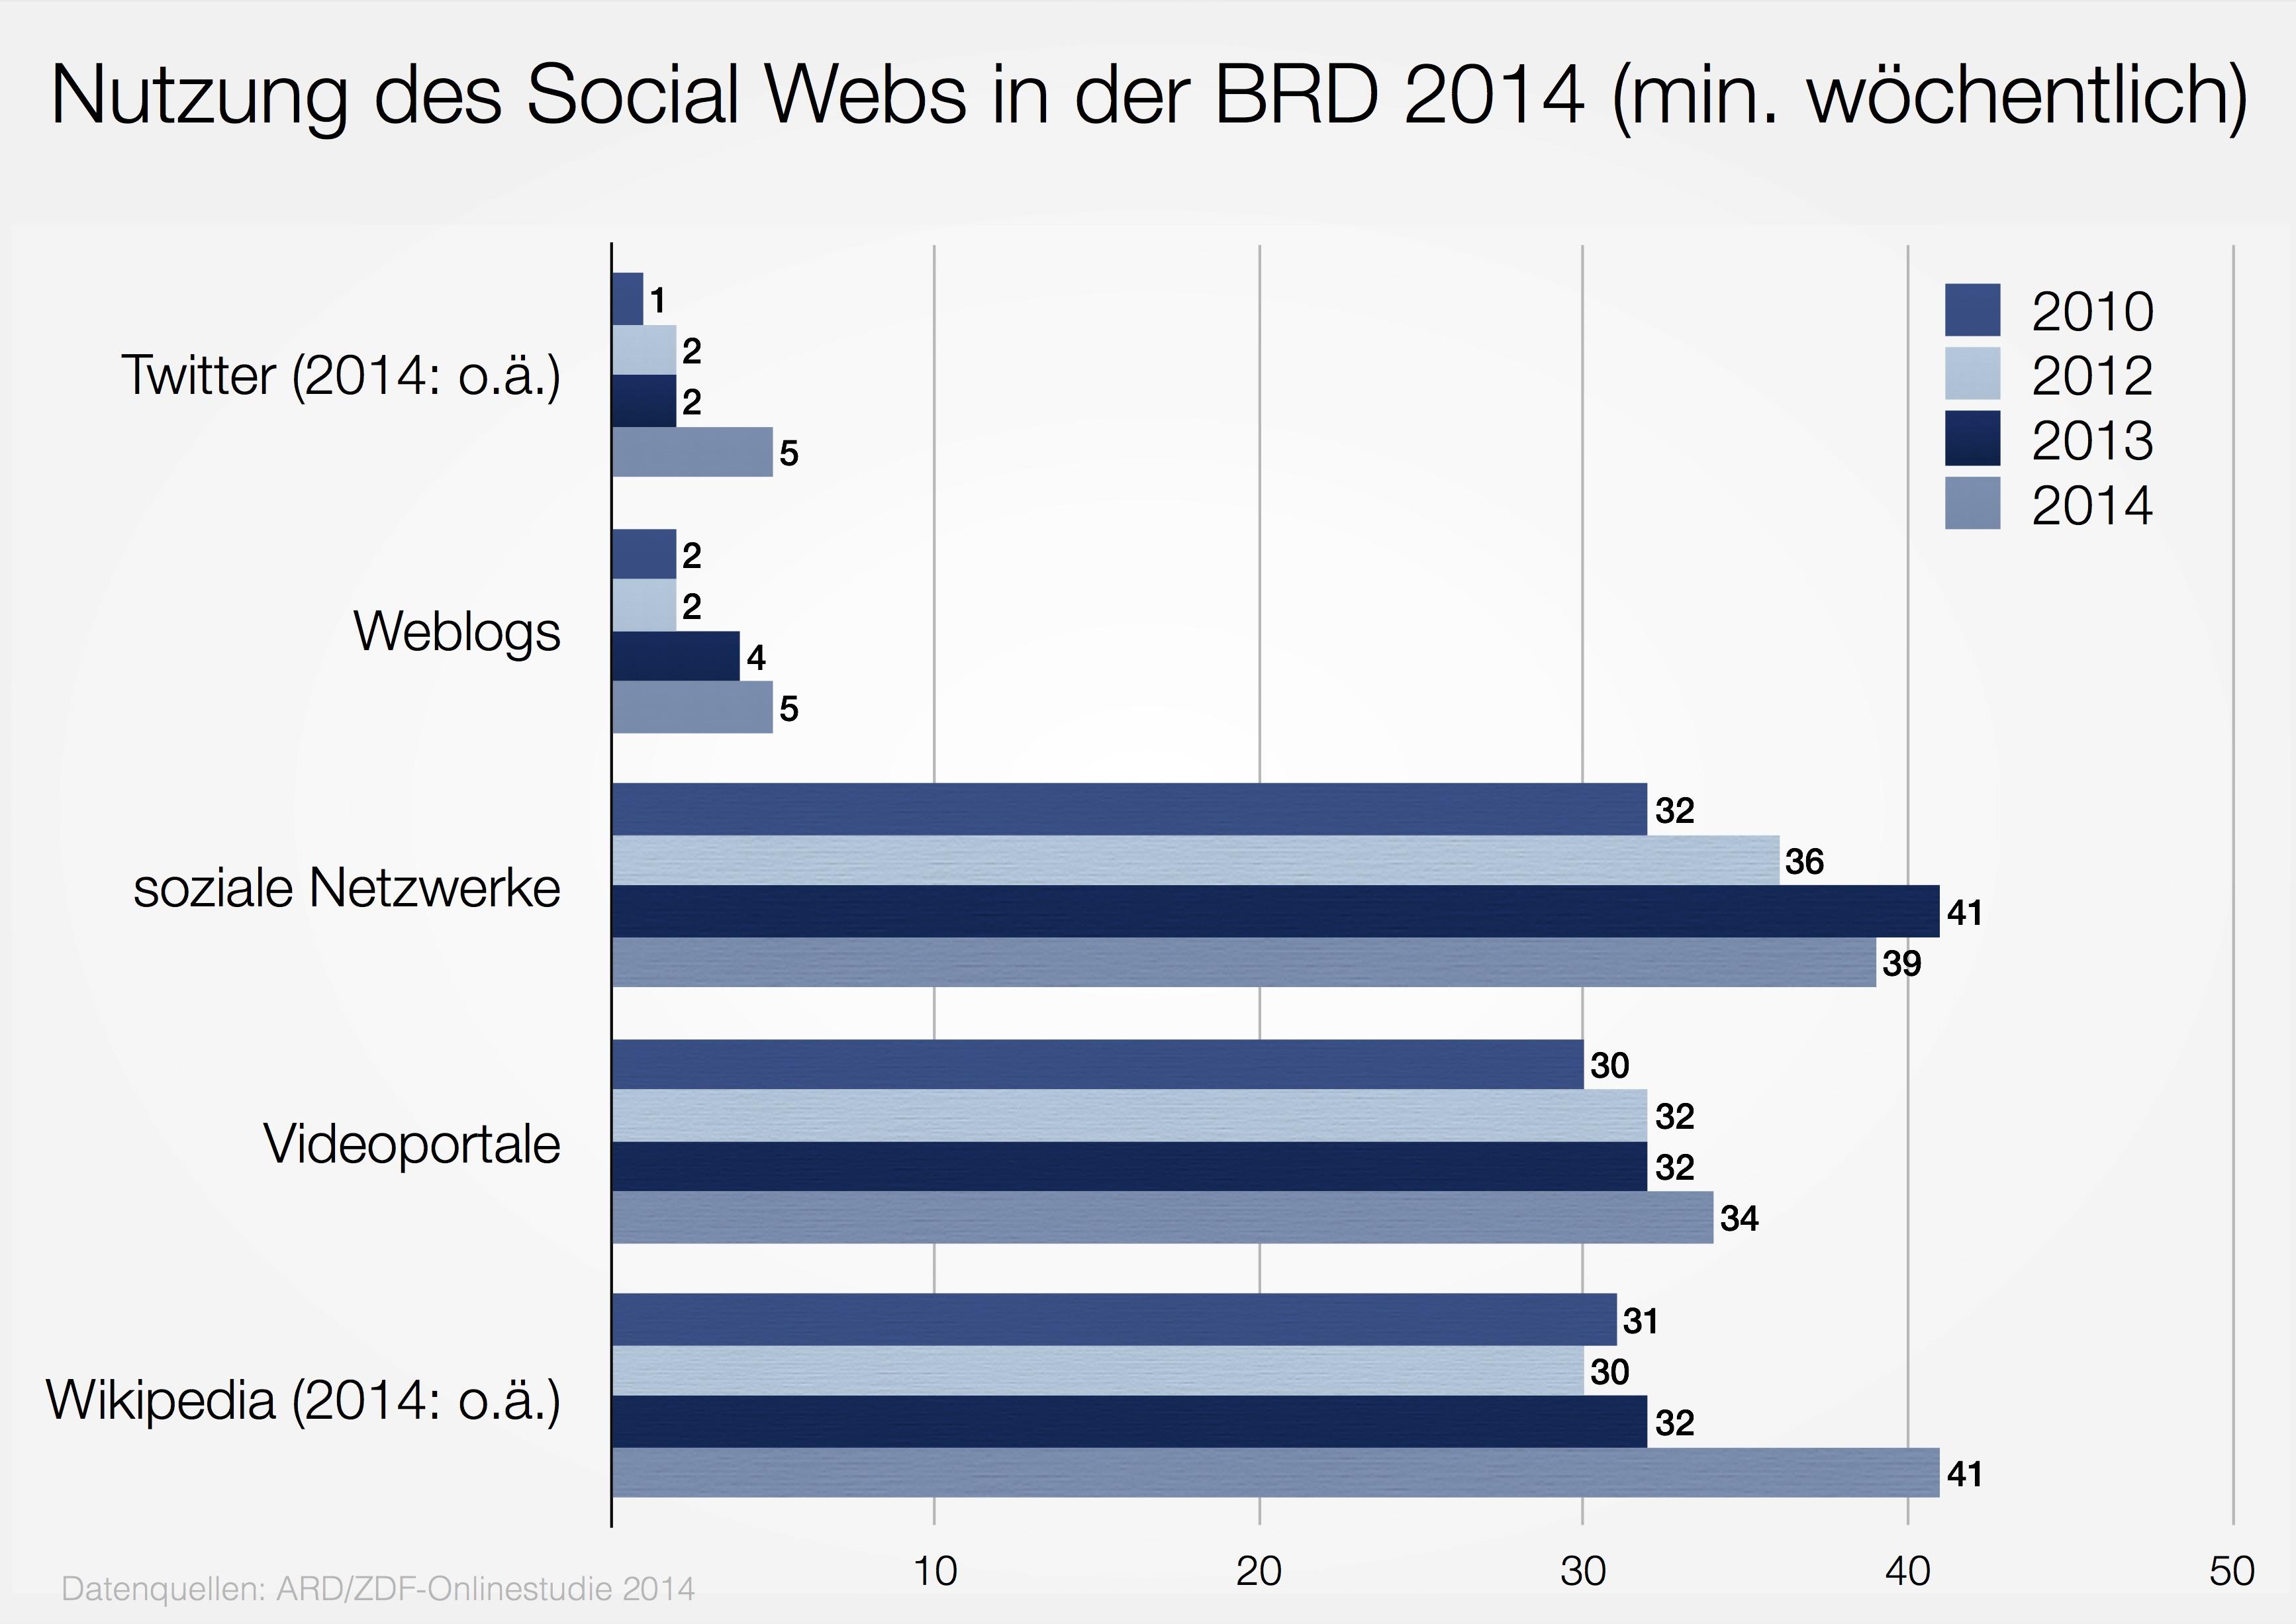 Nutzung des Social Webs 2014